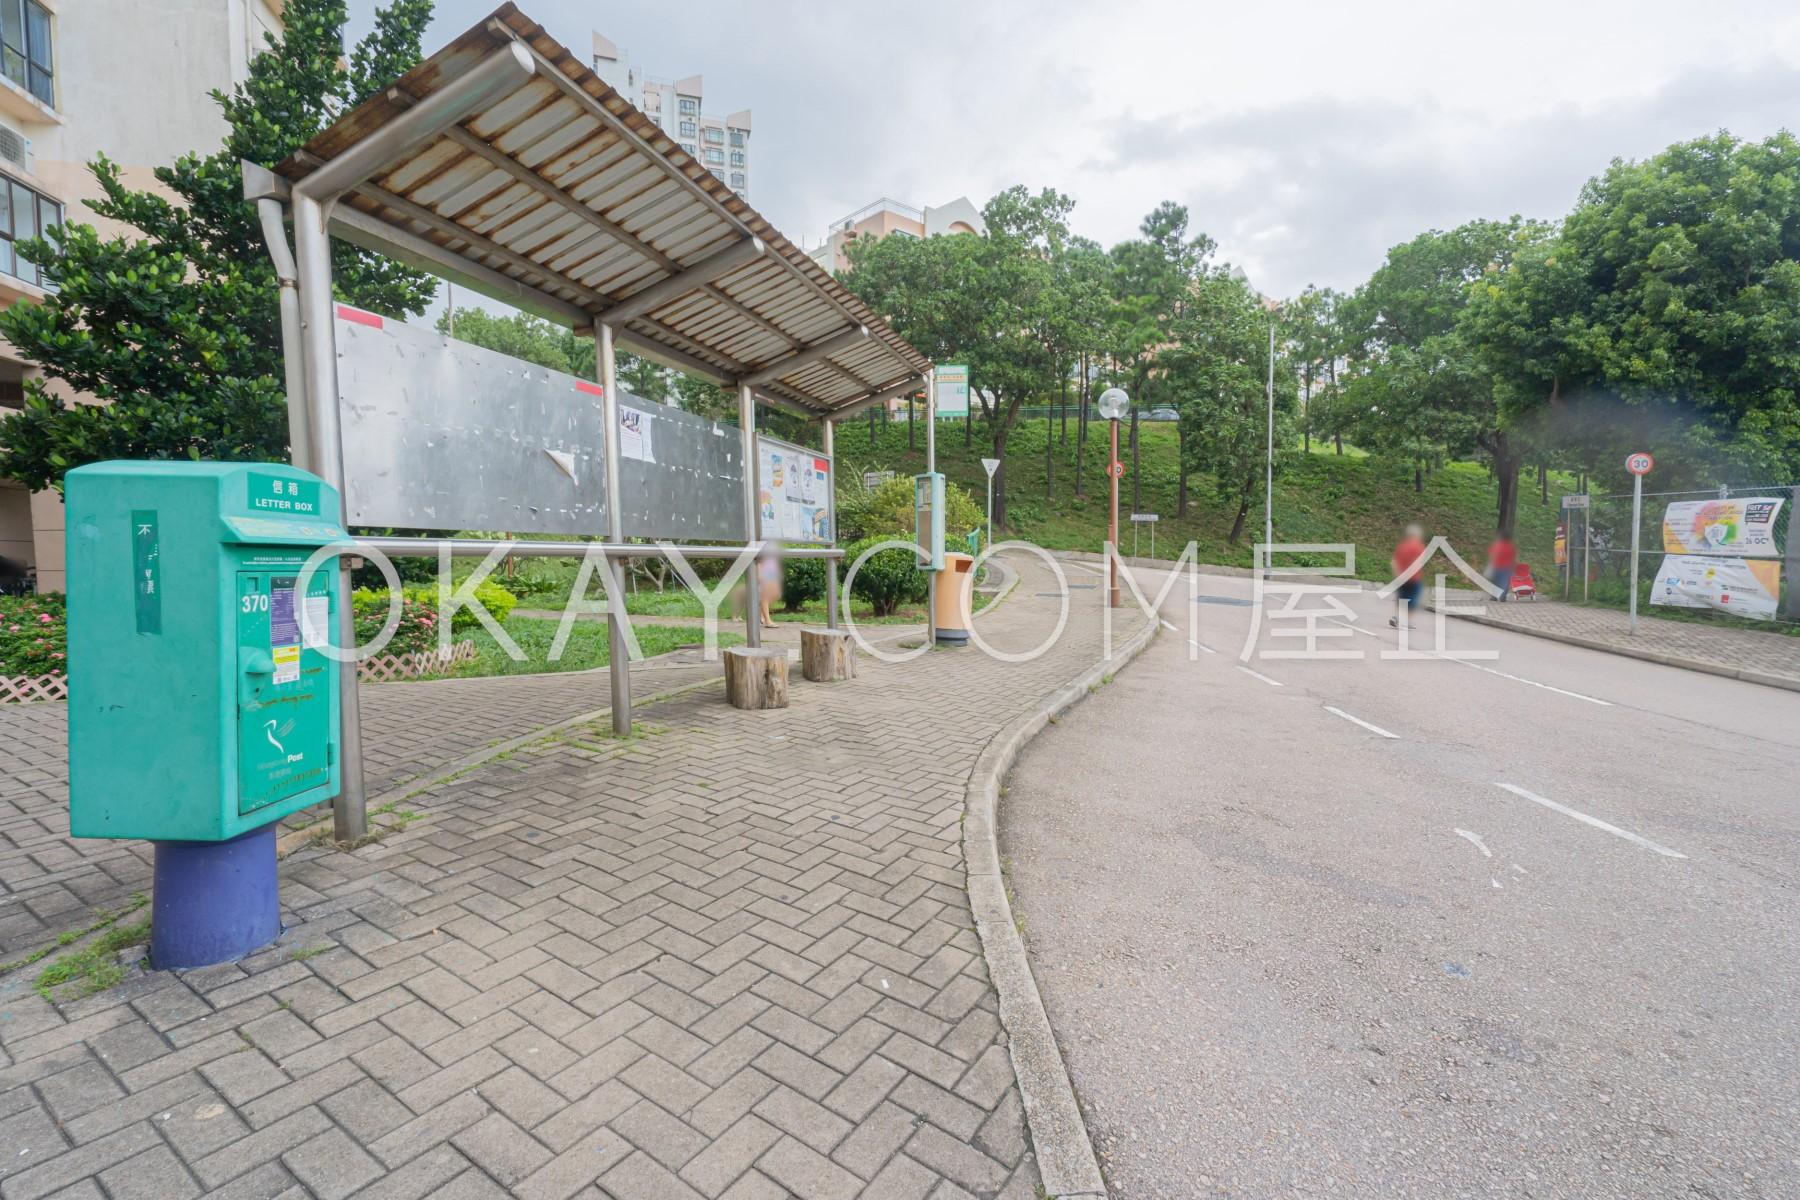 T4 Bus Stop